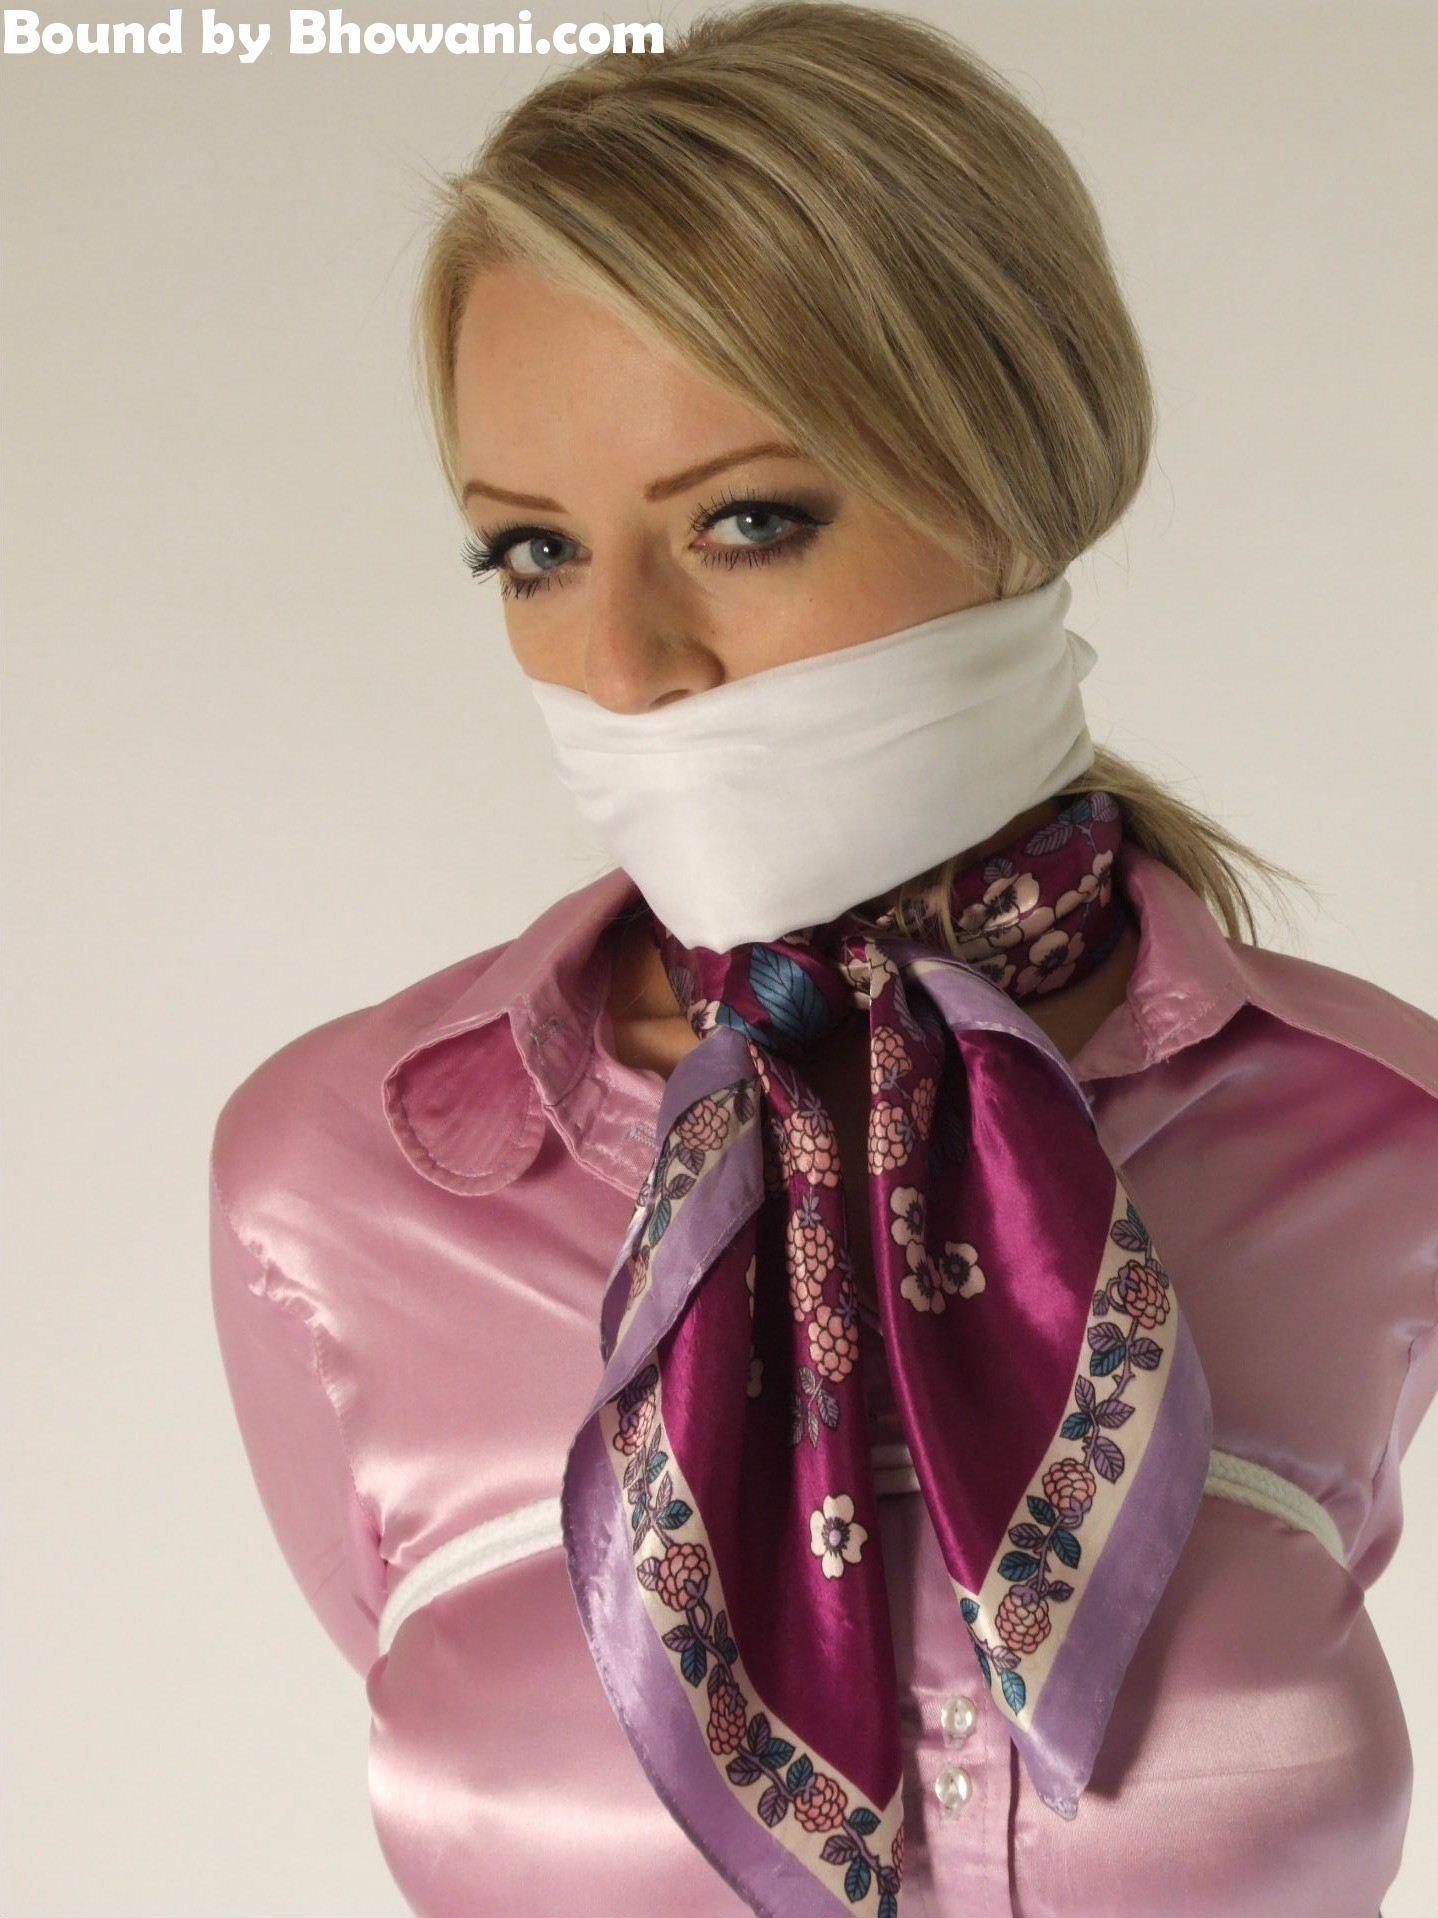 Satin scarf bondage